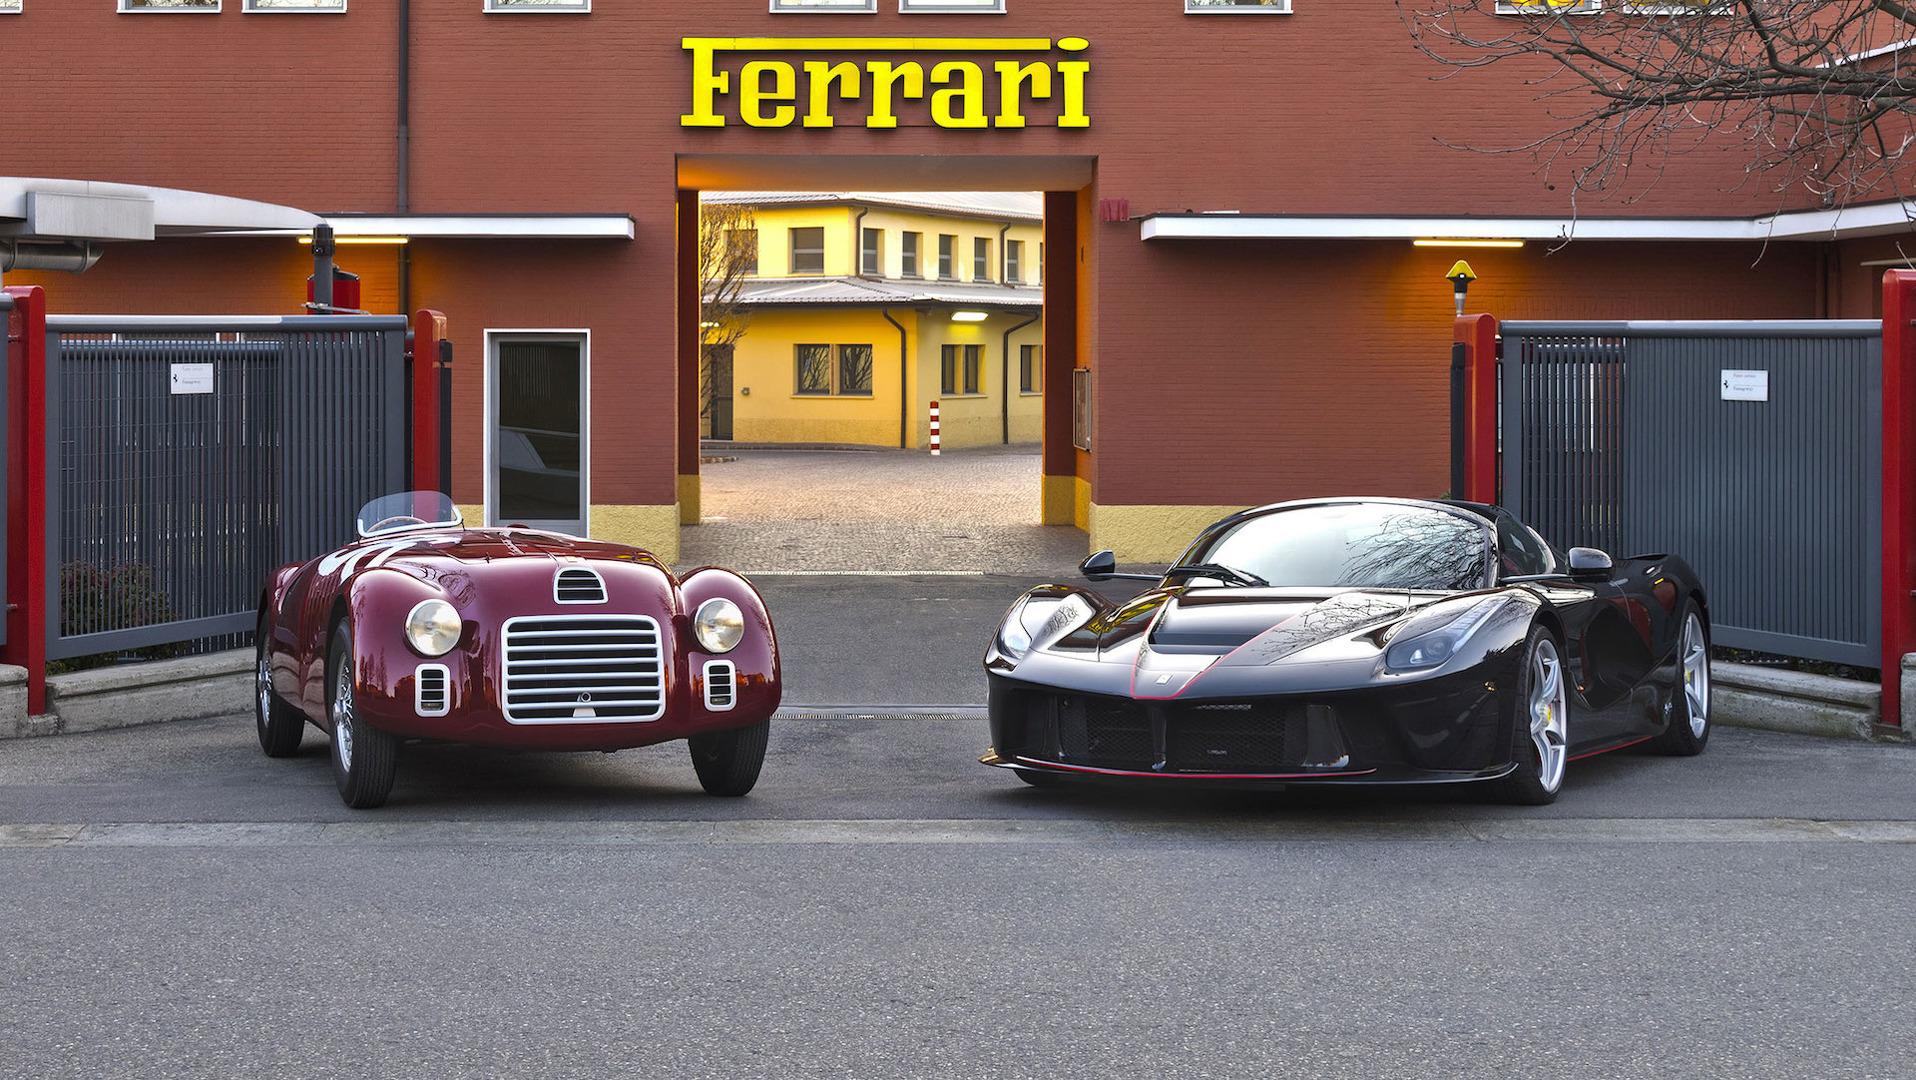 ferrari-70th-anniversary_-_soymotor.jpg